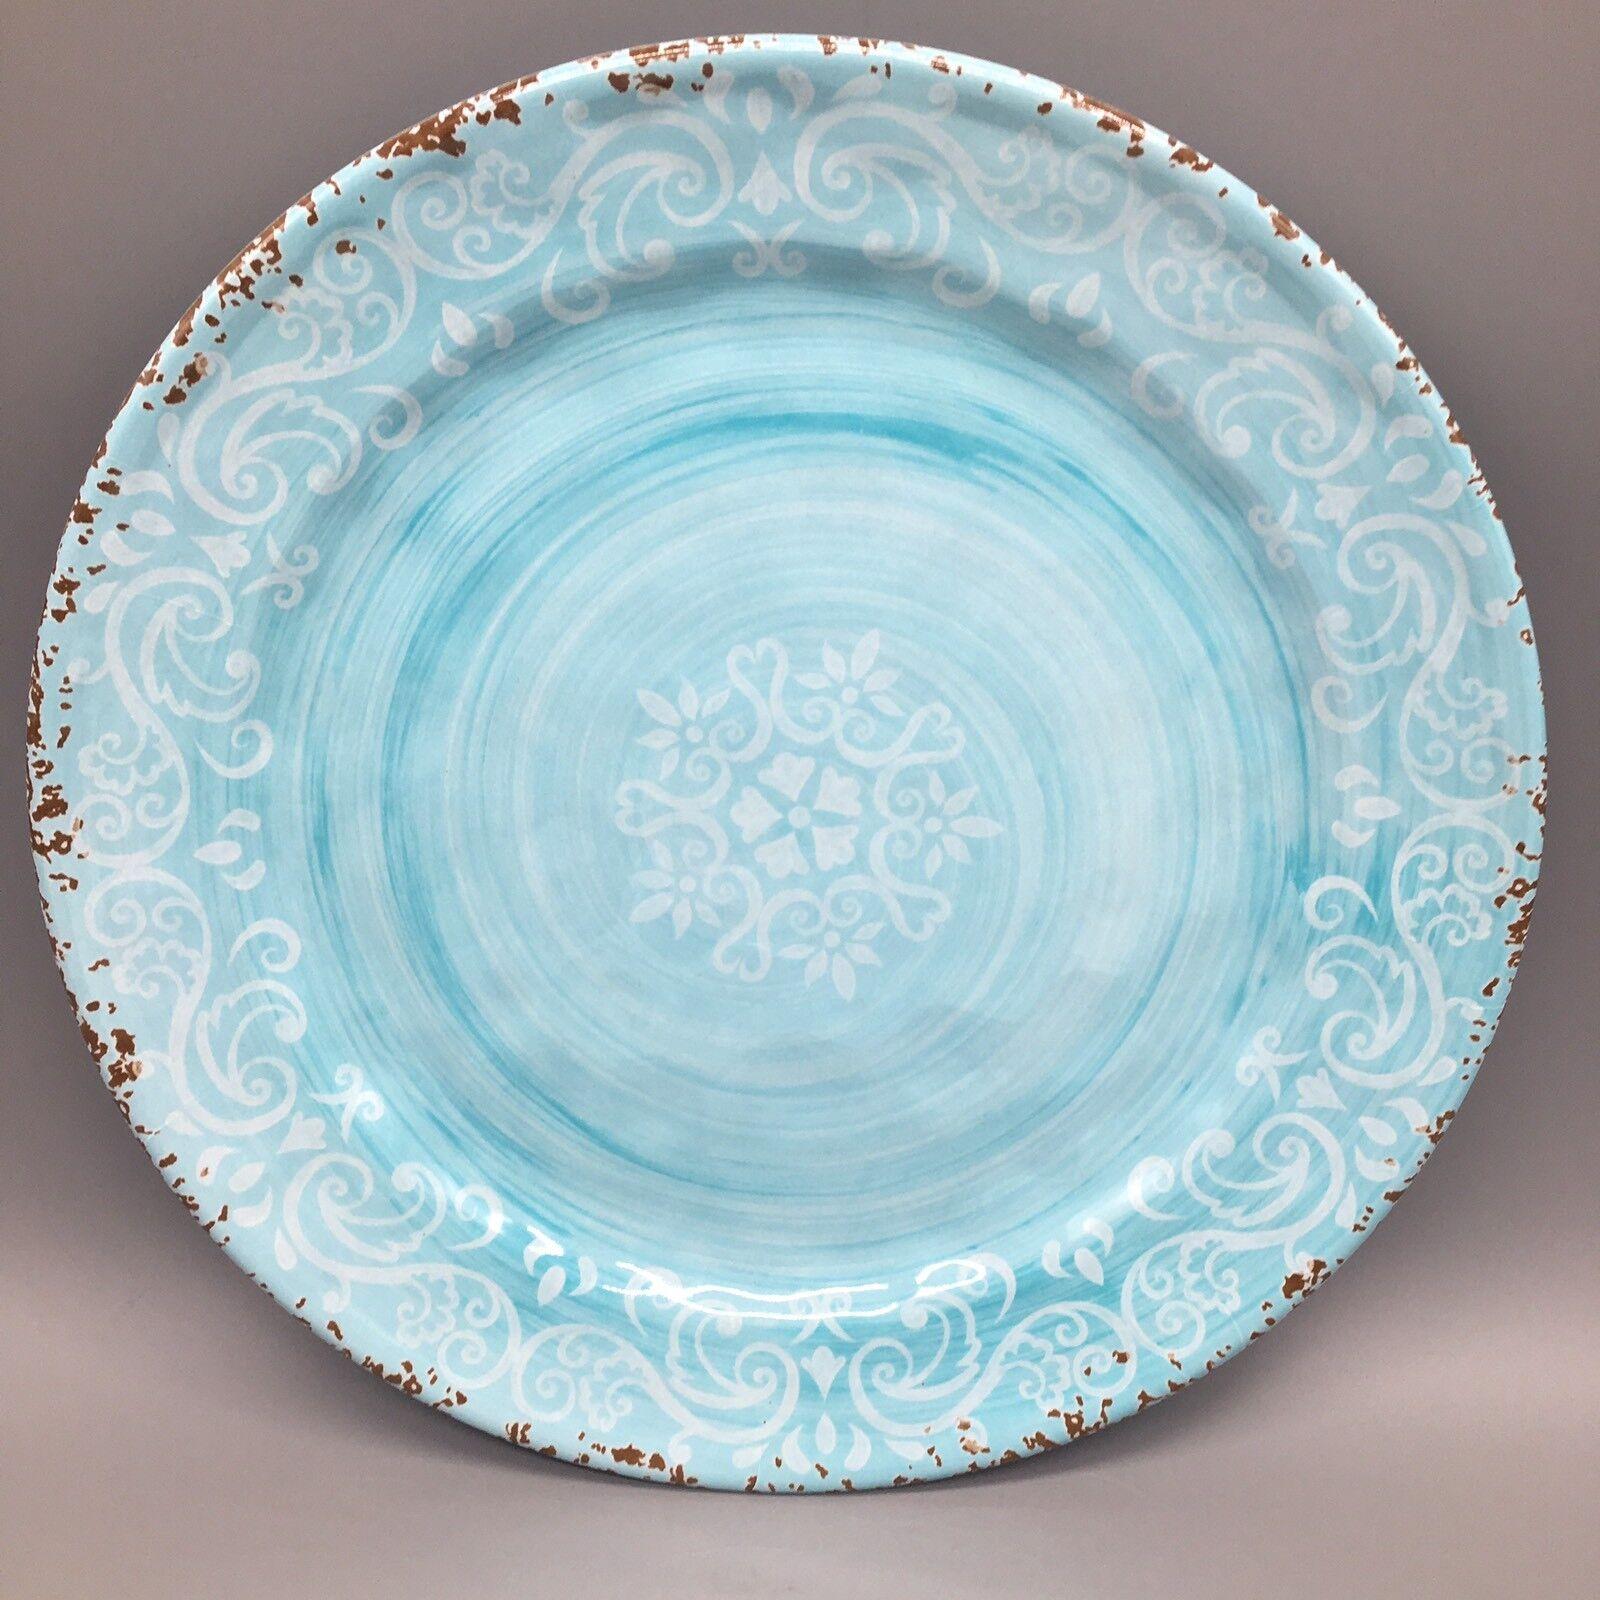 X6 Cynthia Rowley Aqua bleu MELAMINE Dinner Plate Set Rustic Medallion Print NEW